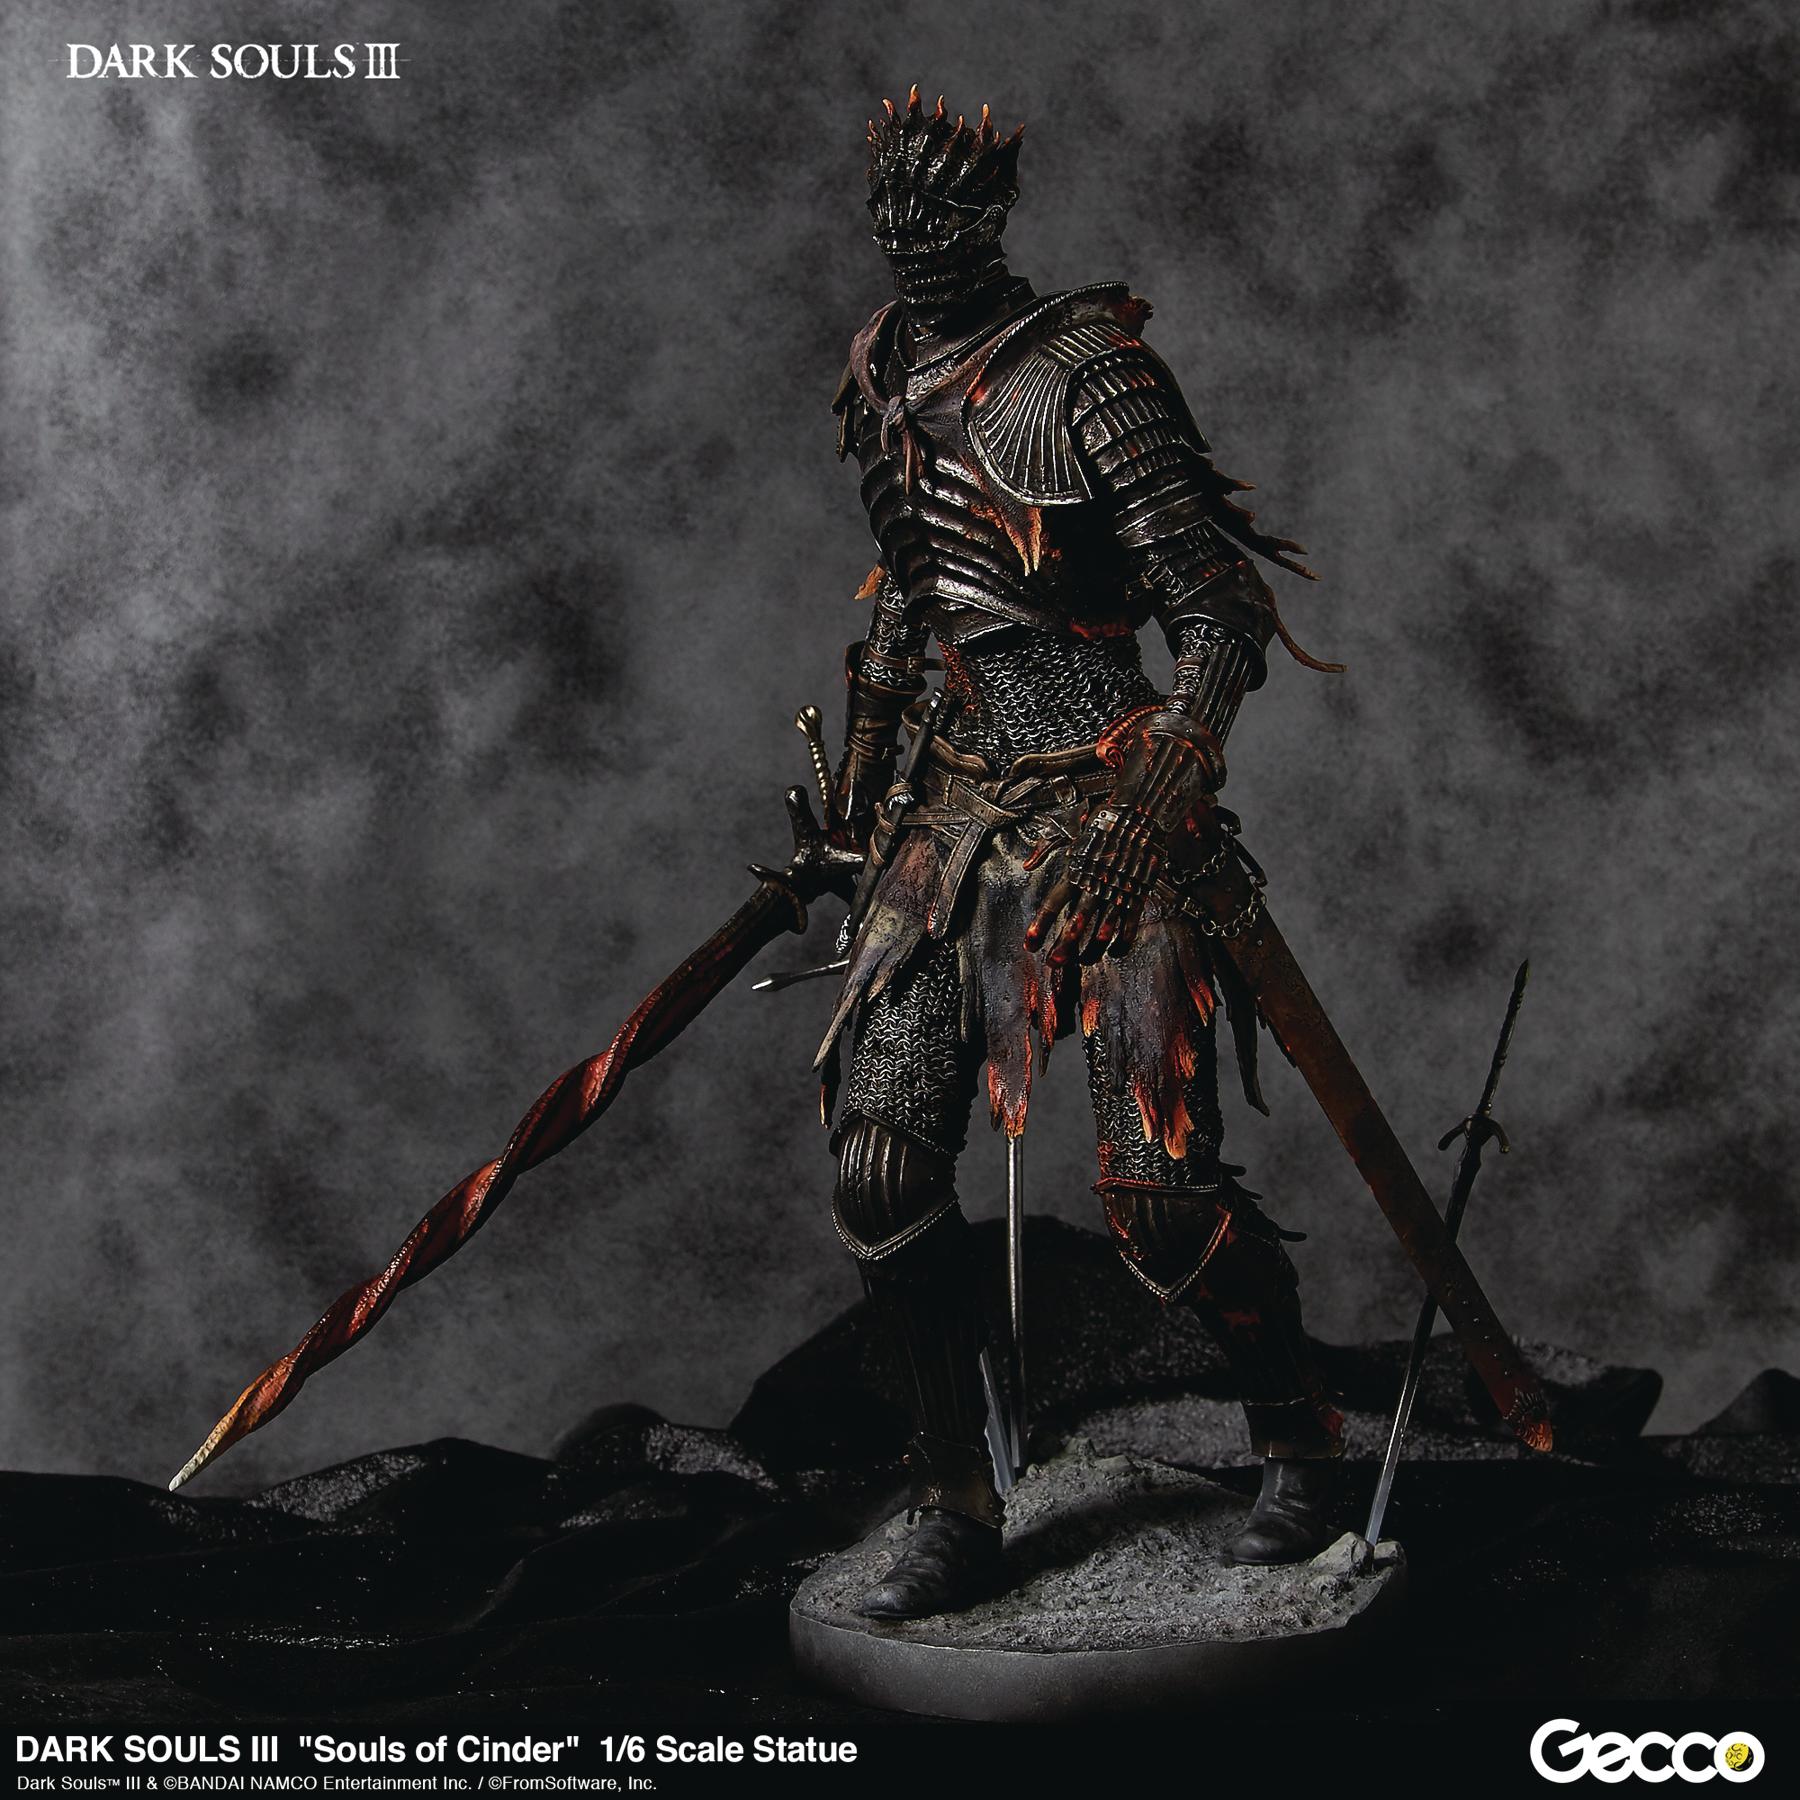 Dark Souls III - Souls of Cinder PVC Figure